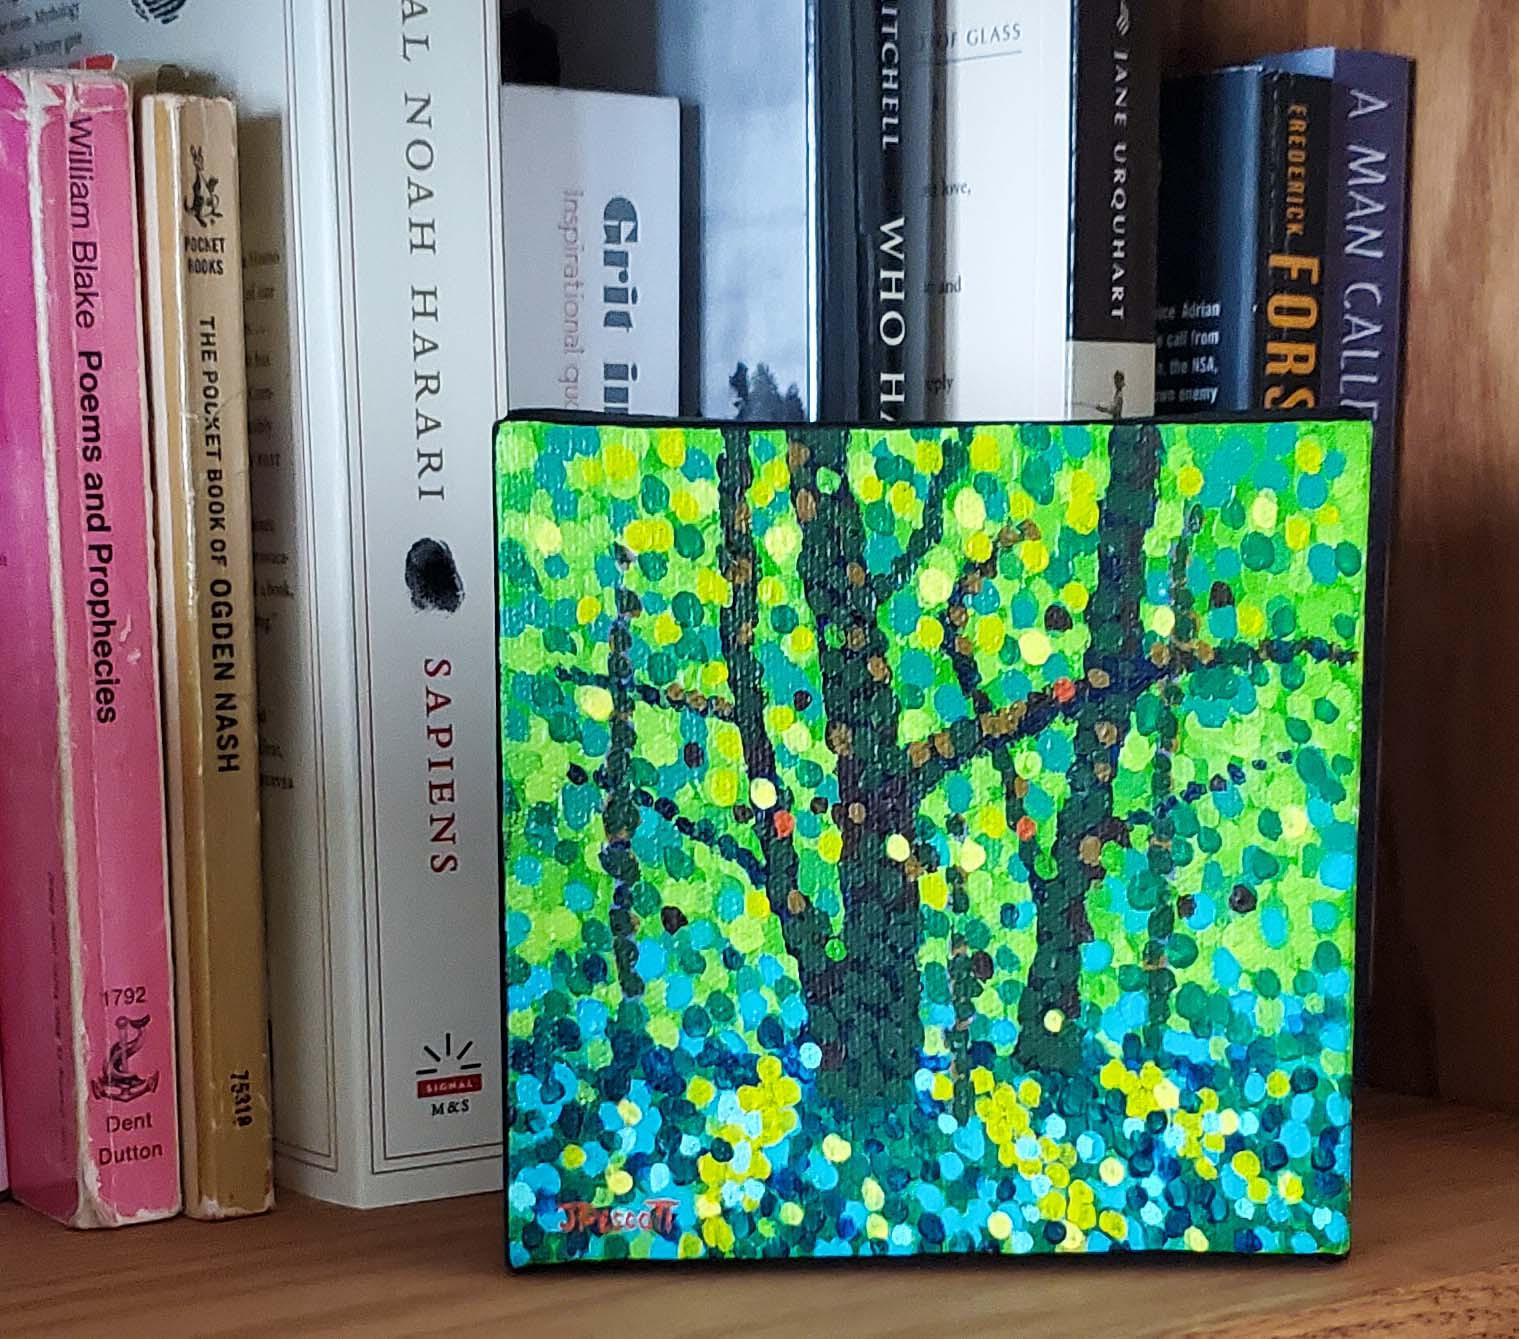 Woodland shadows bookshelf o3njgk